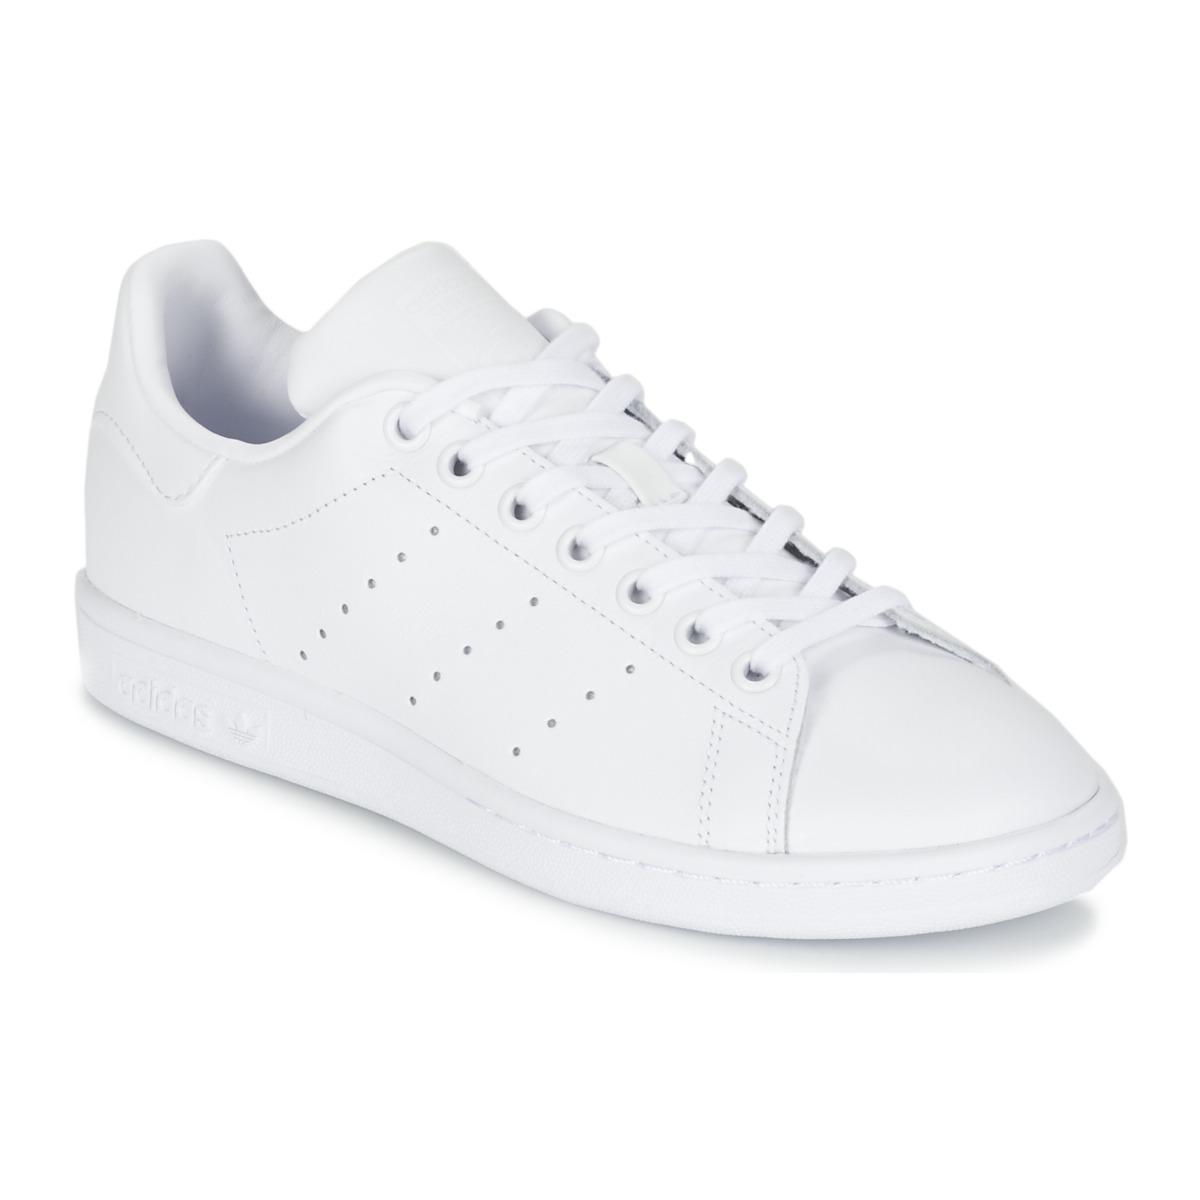 adidas originals stan smith j blanc chaussure pas cher avec chaussures baskets. Black Bedroom Furniture Sets. Home Design Ideas